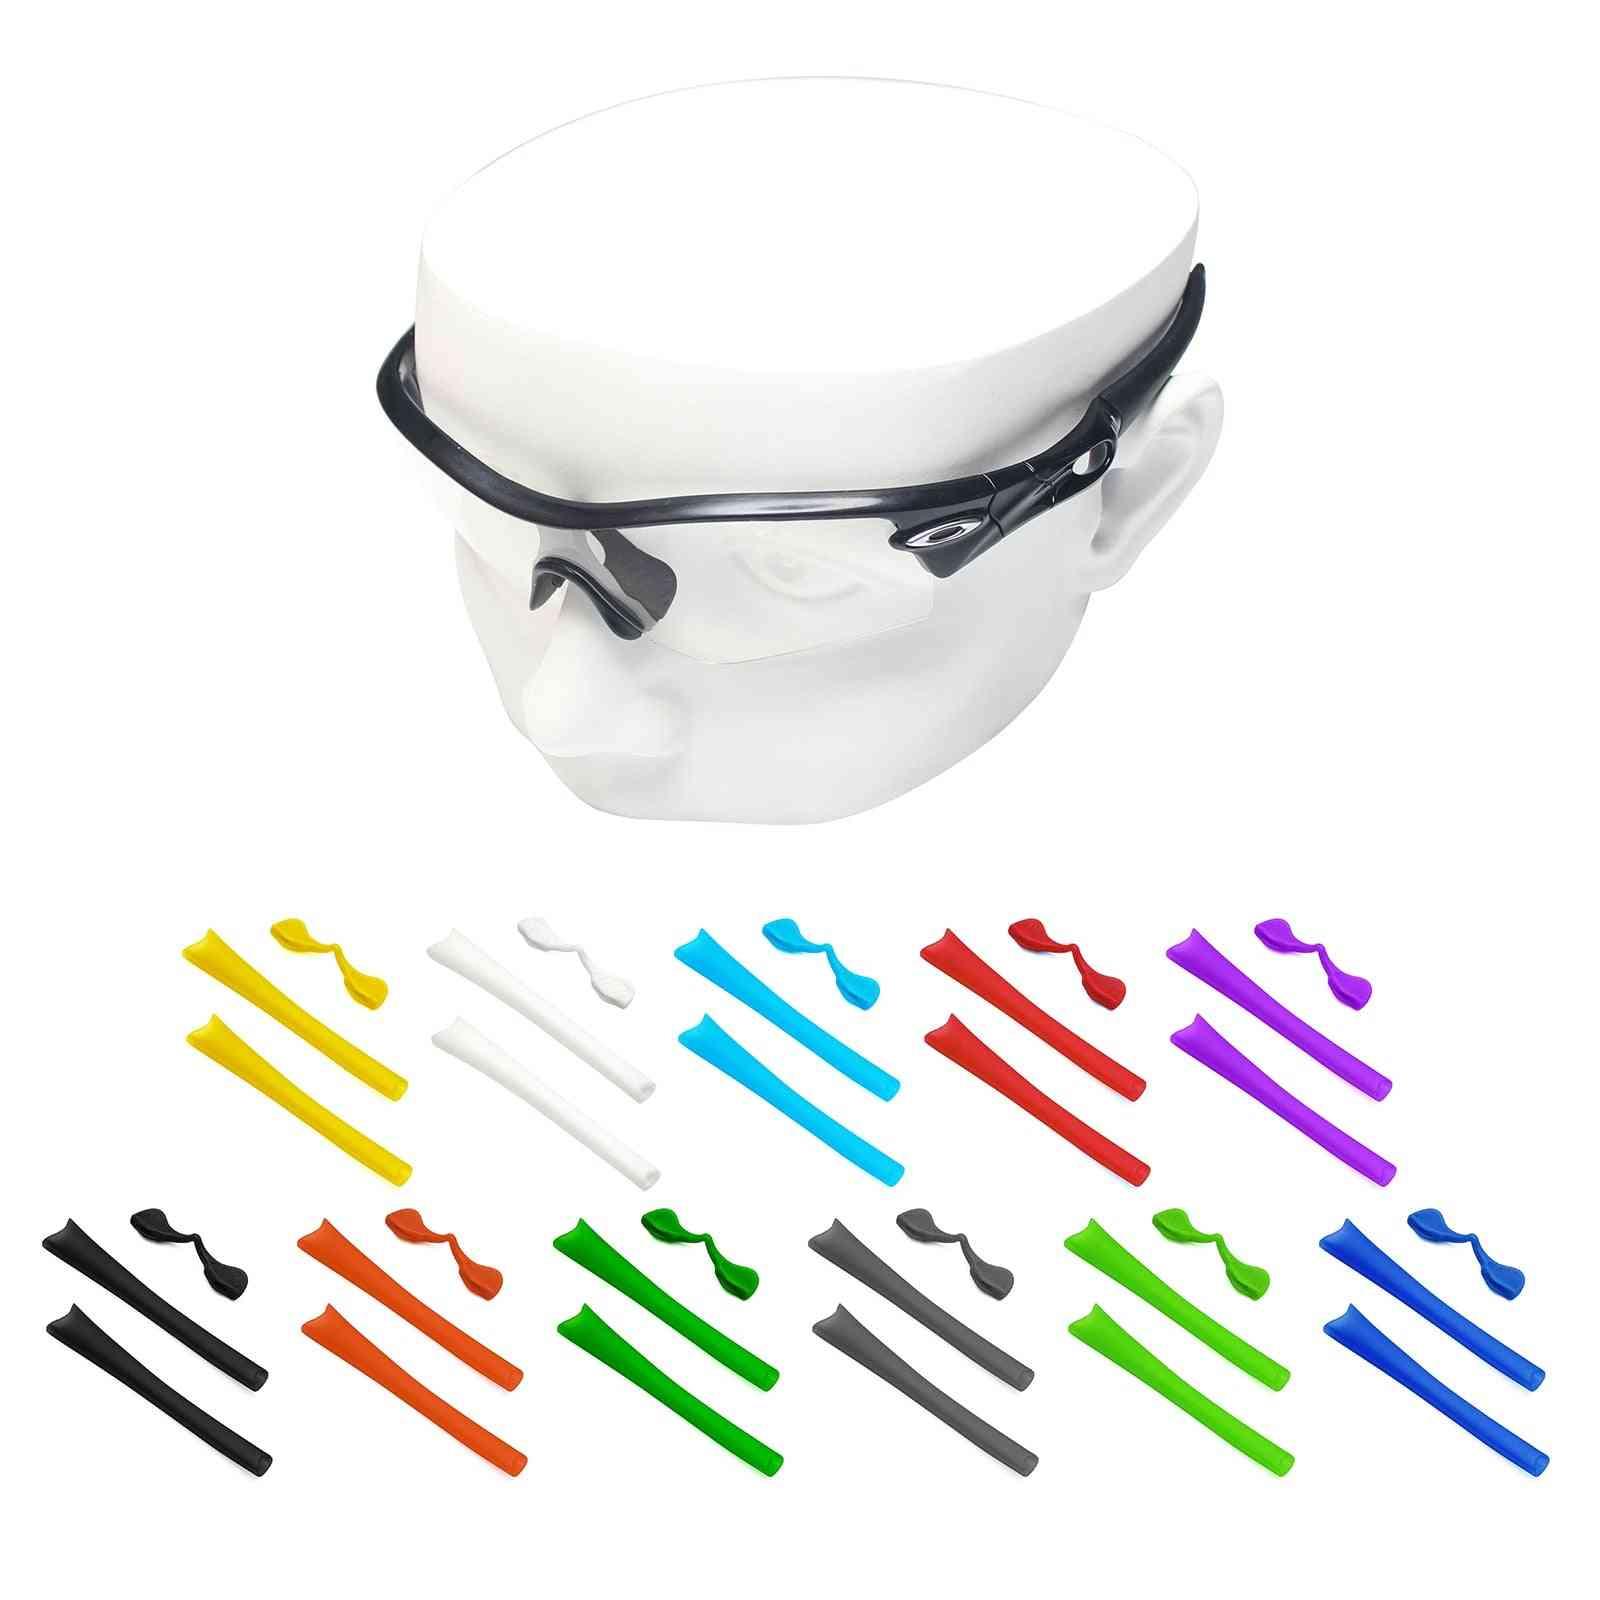 Rubber Kits Nose Pads & Earsocks, Radar Path Sunglasses